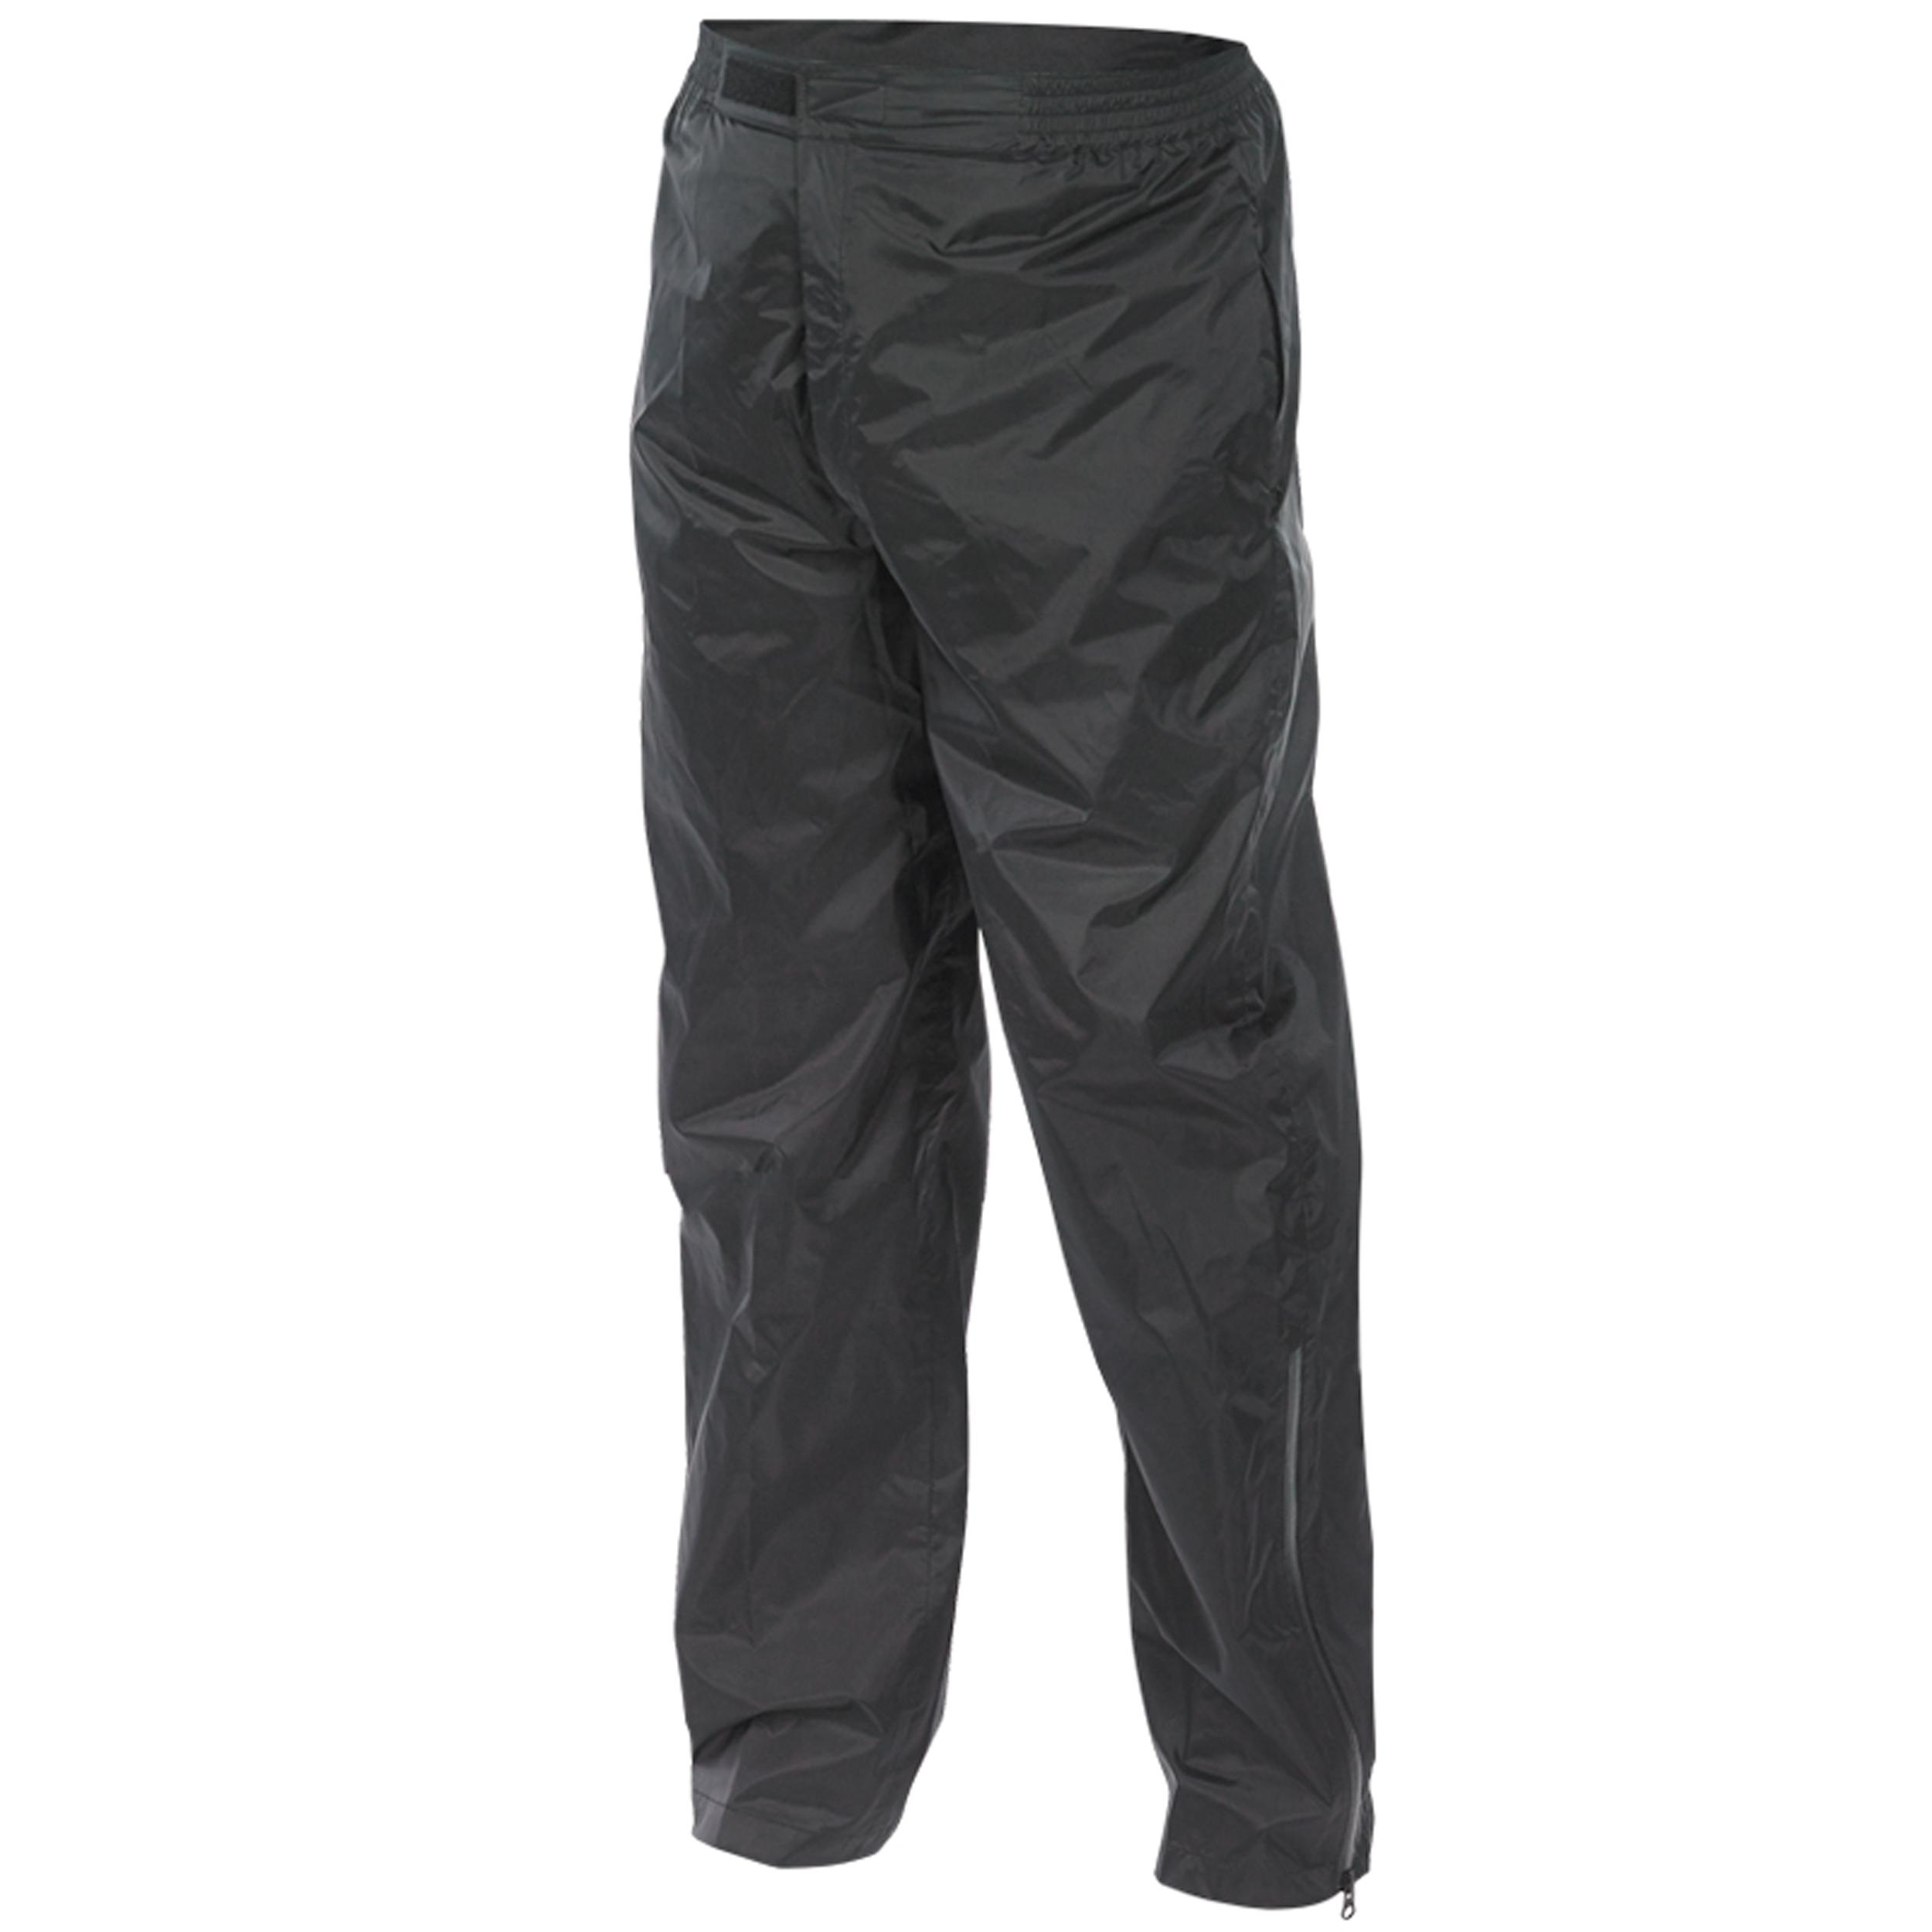 Snugpak Rp1 Rain Pants Black Sm